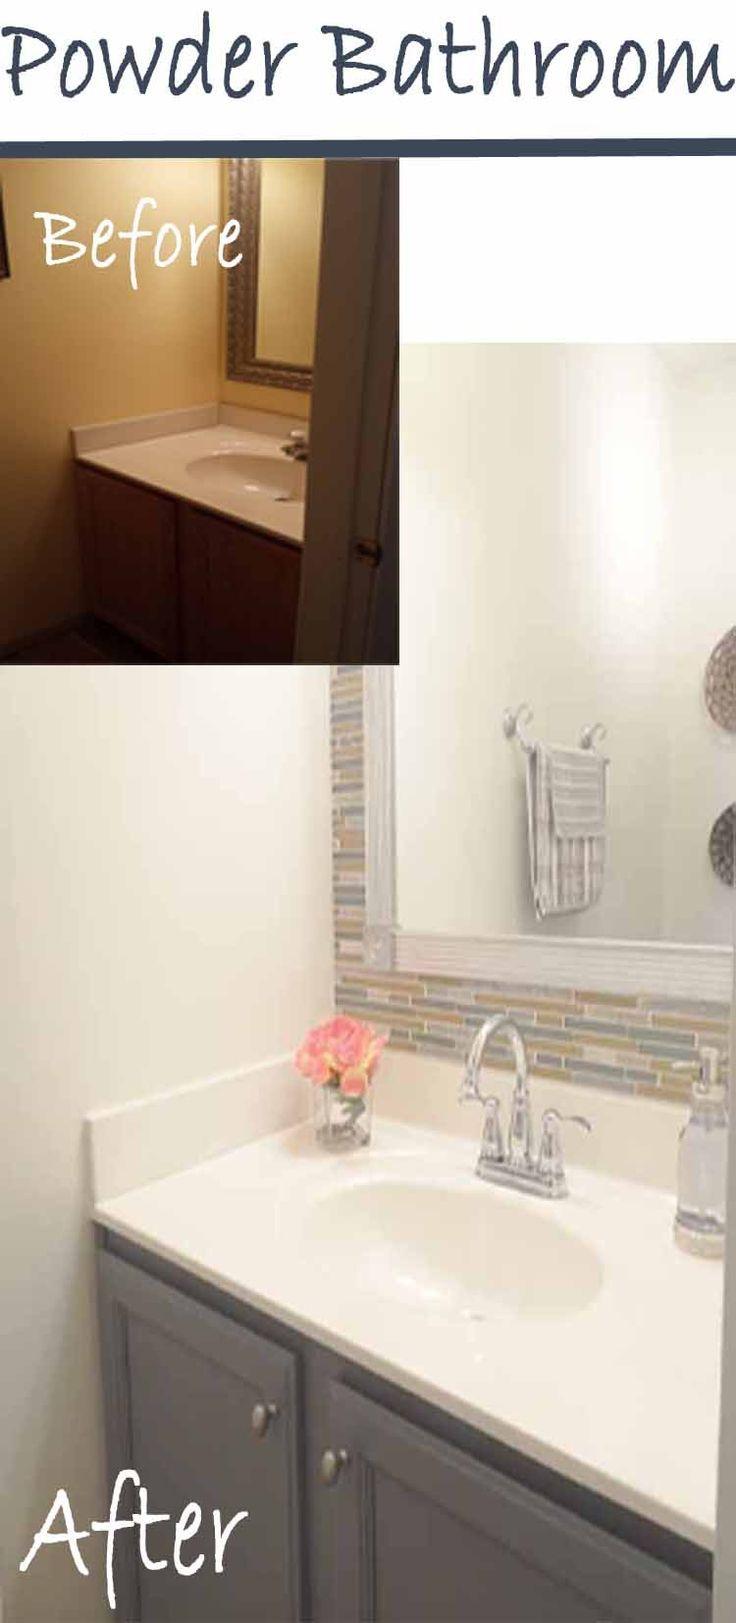 277 best Budget Friendly Home Decor images on Pinterest | Deko, Free ...